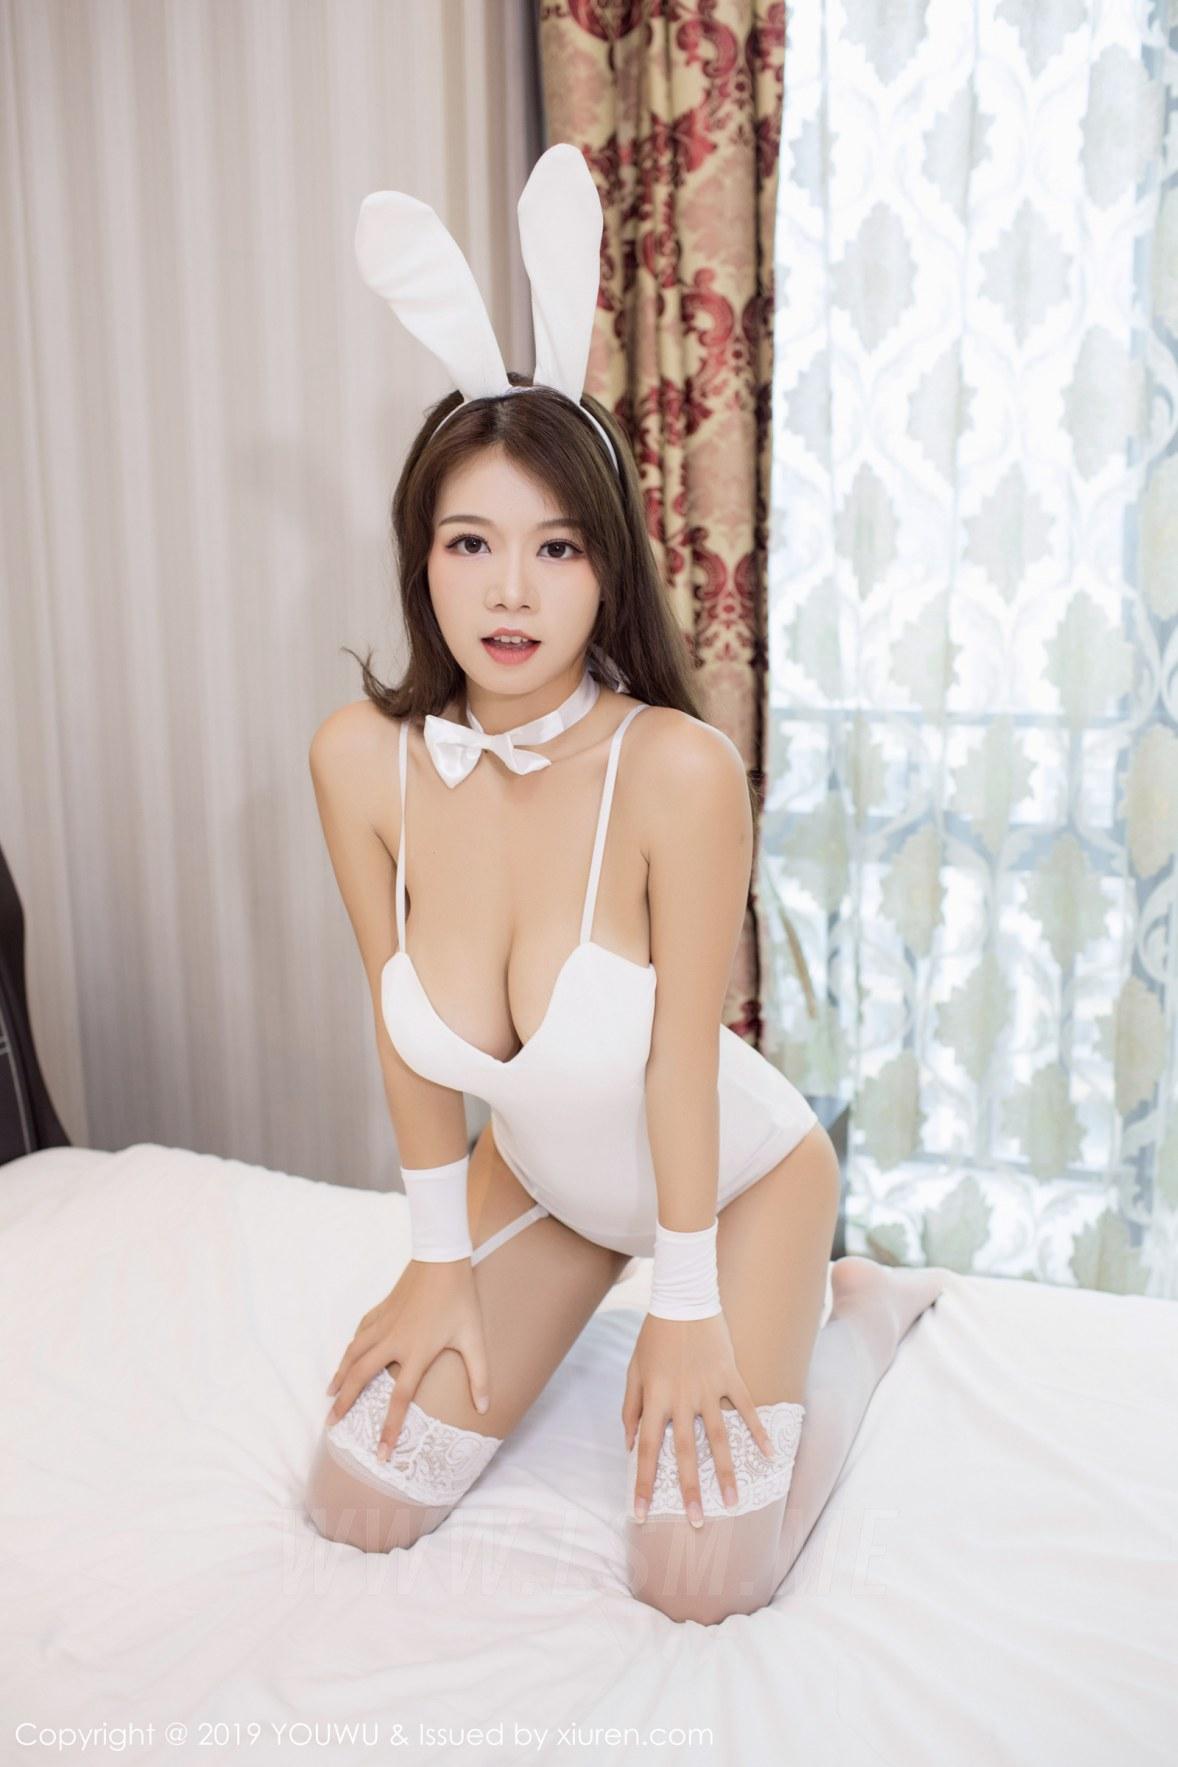 YouWu 尤物馆 Vol.150 性感兔女郎 Luffy菲菲 - 4